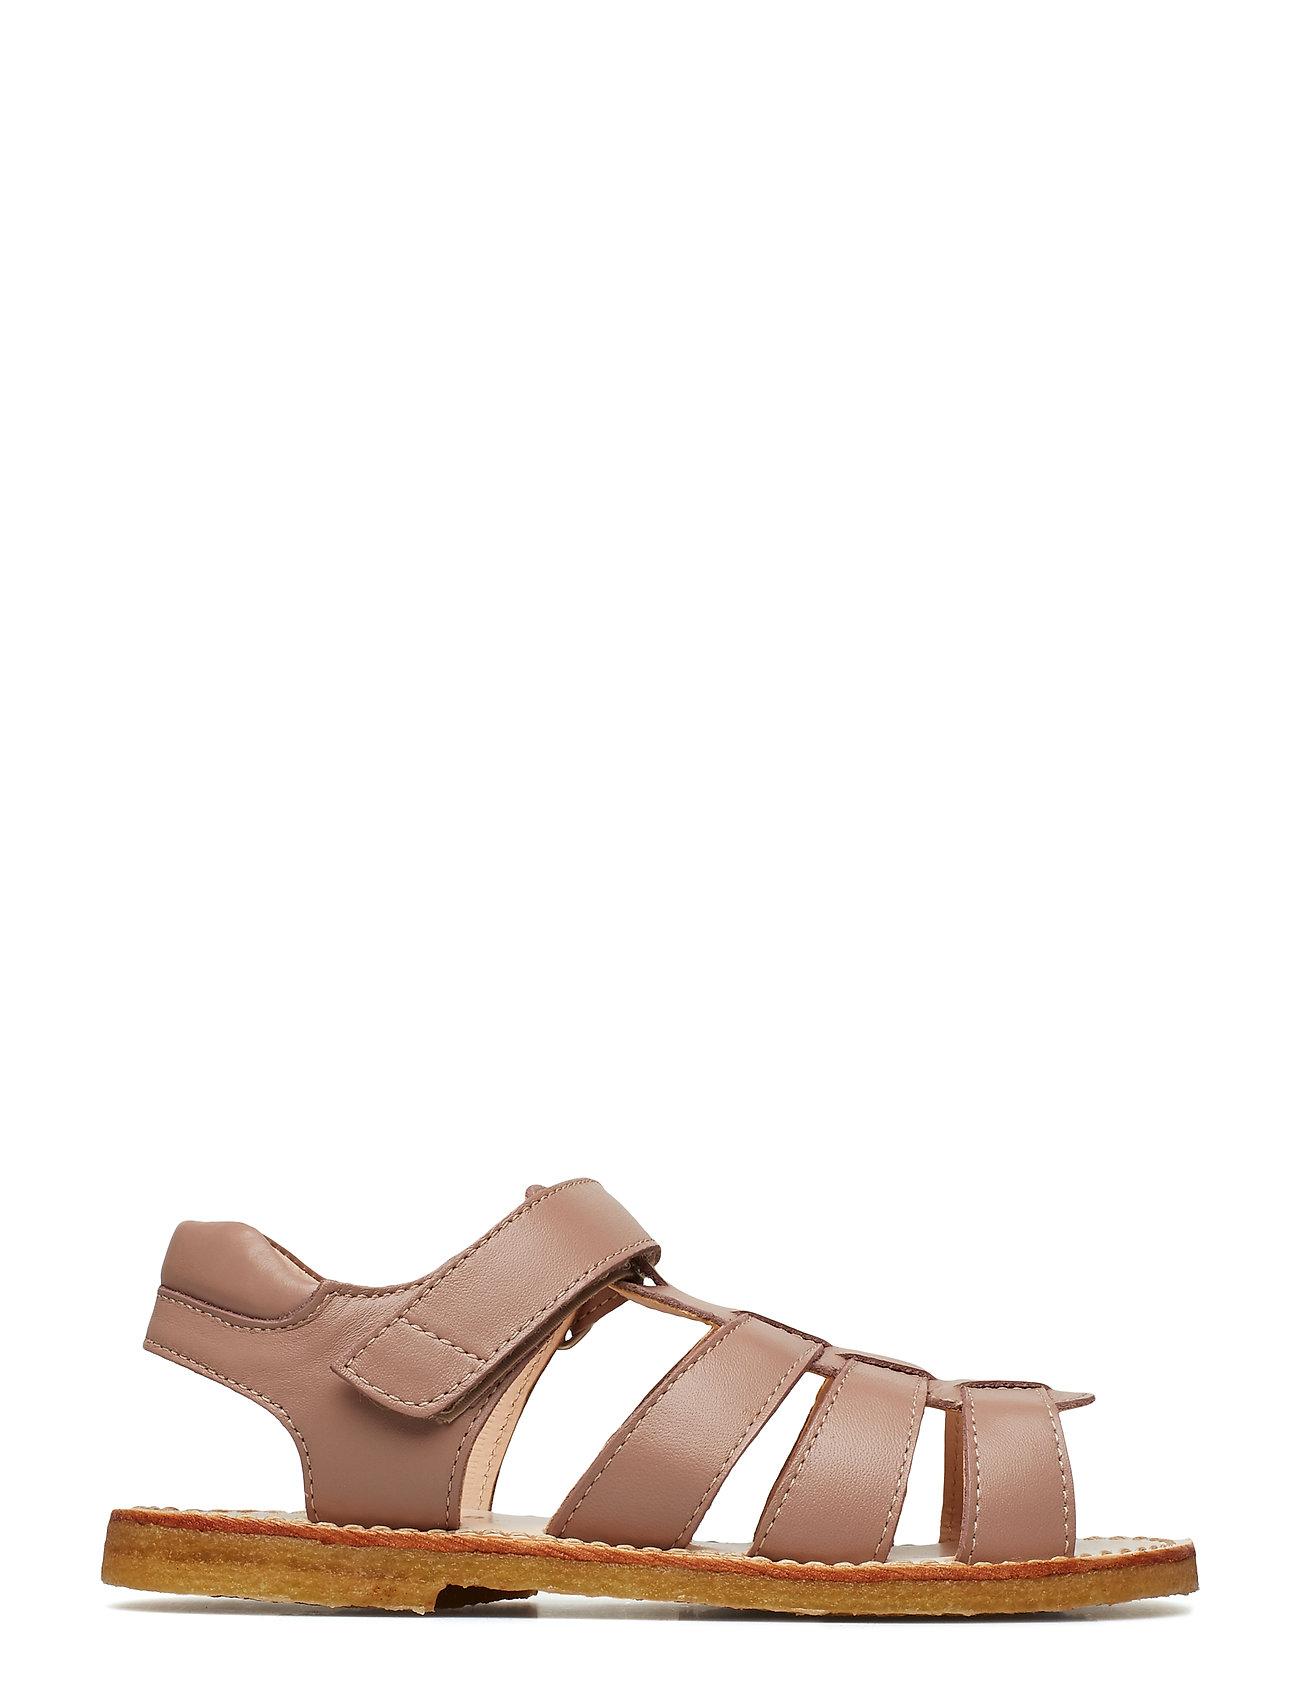 Sandals Flat Open Toe Op Sandaler Sølv ANGULUS